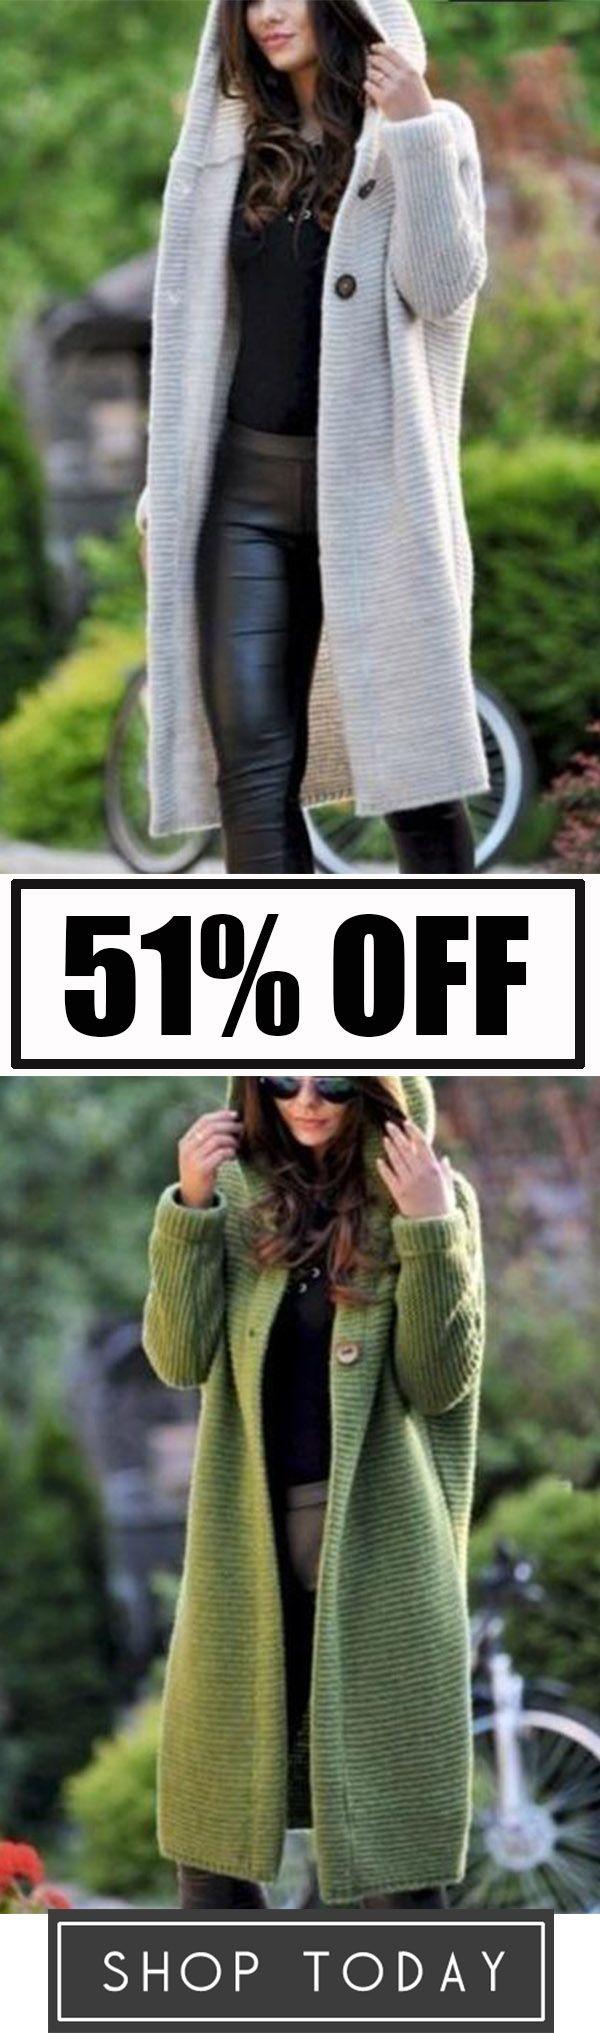 Fashion Hooded Long Cardigan Jacket Autumn and Winter Warm Sweater Long Coat 17